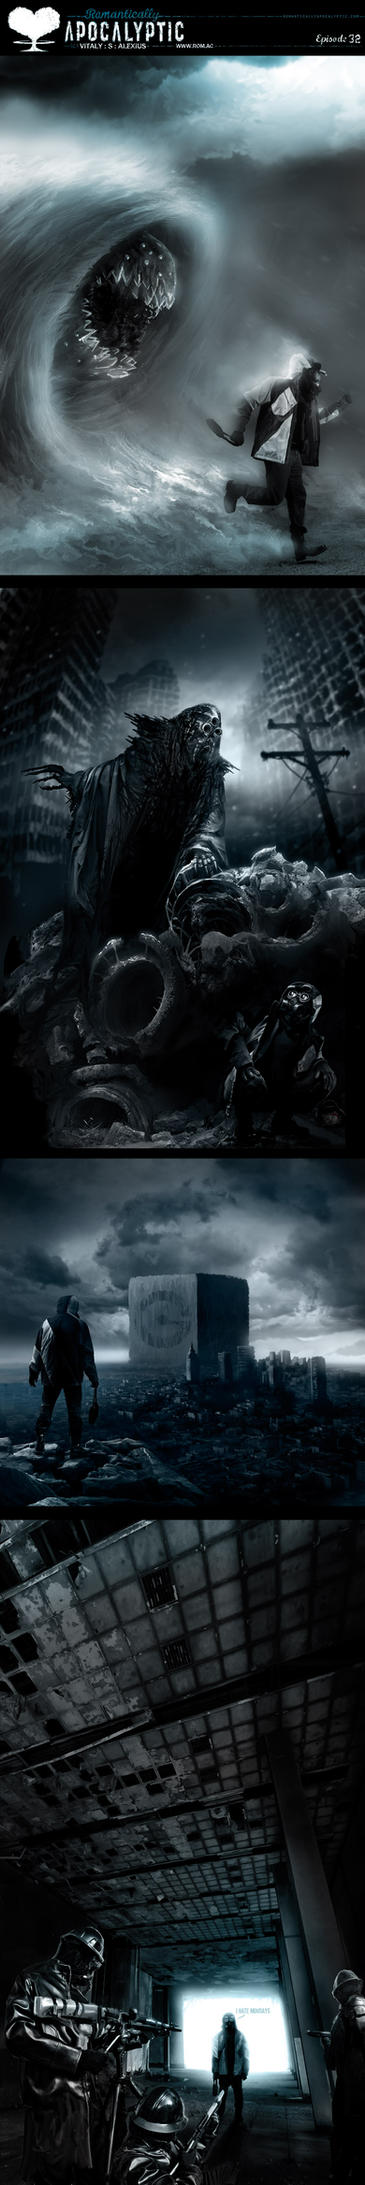 Romantically Apocalyptic 32 by alexiuss